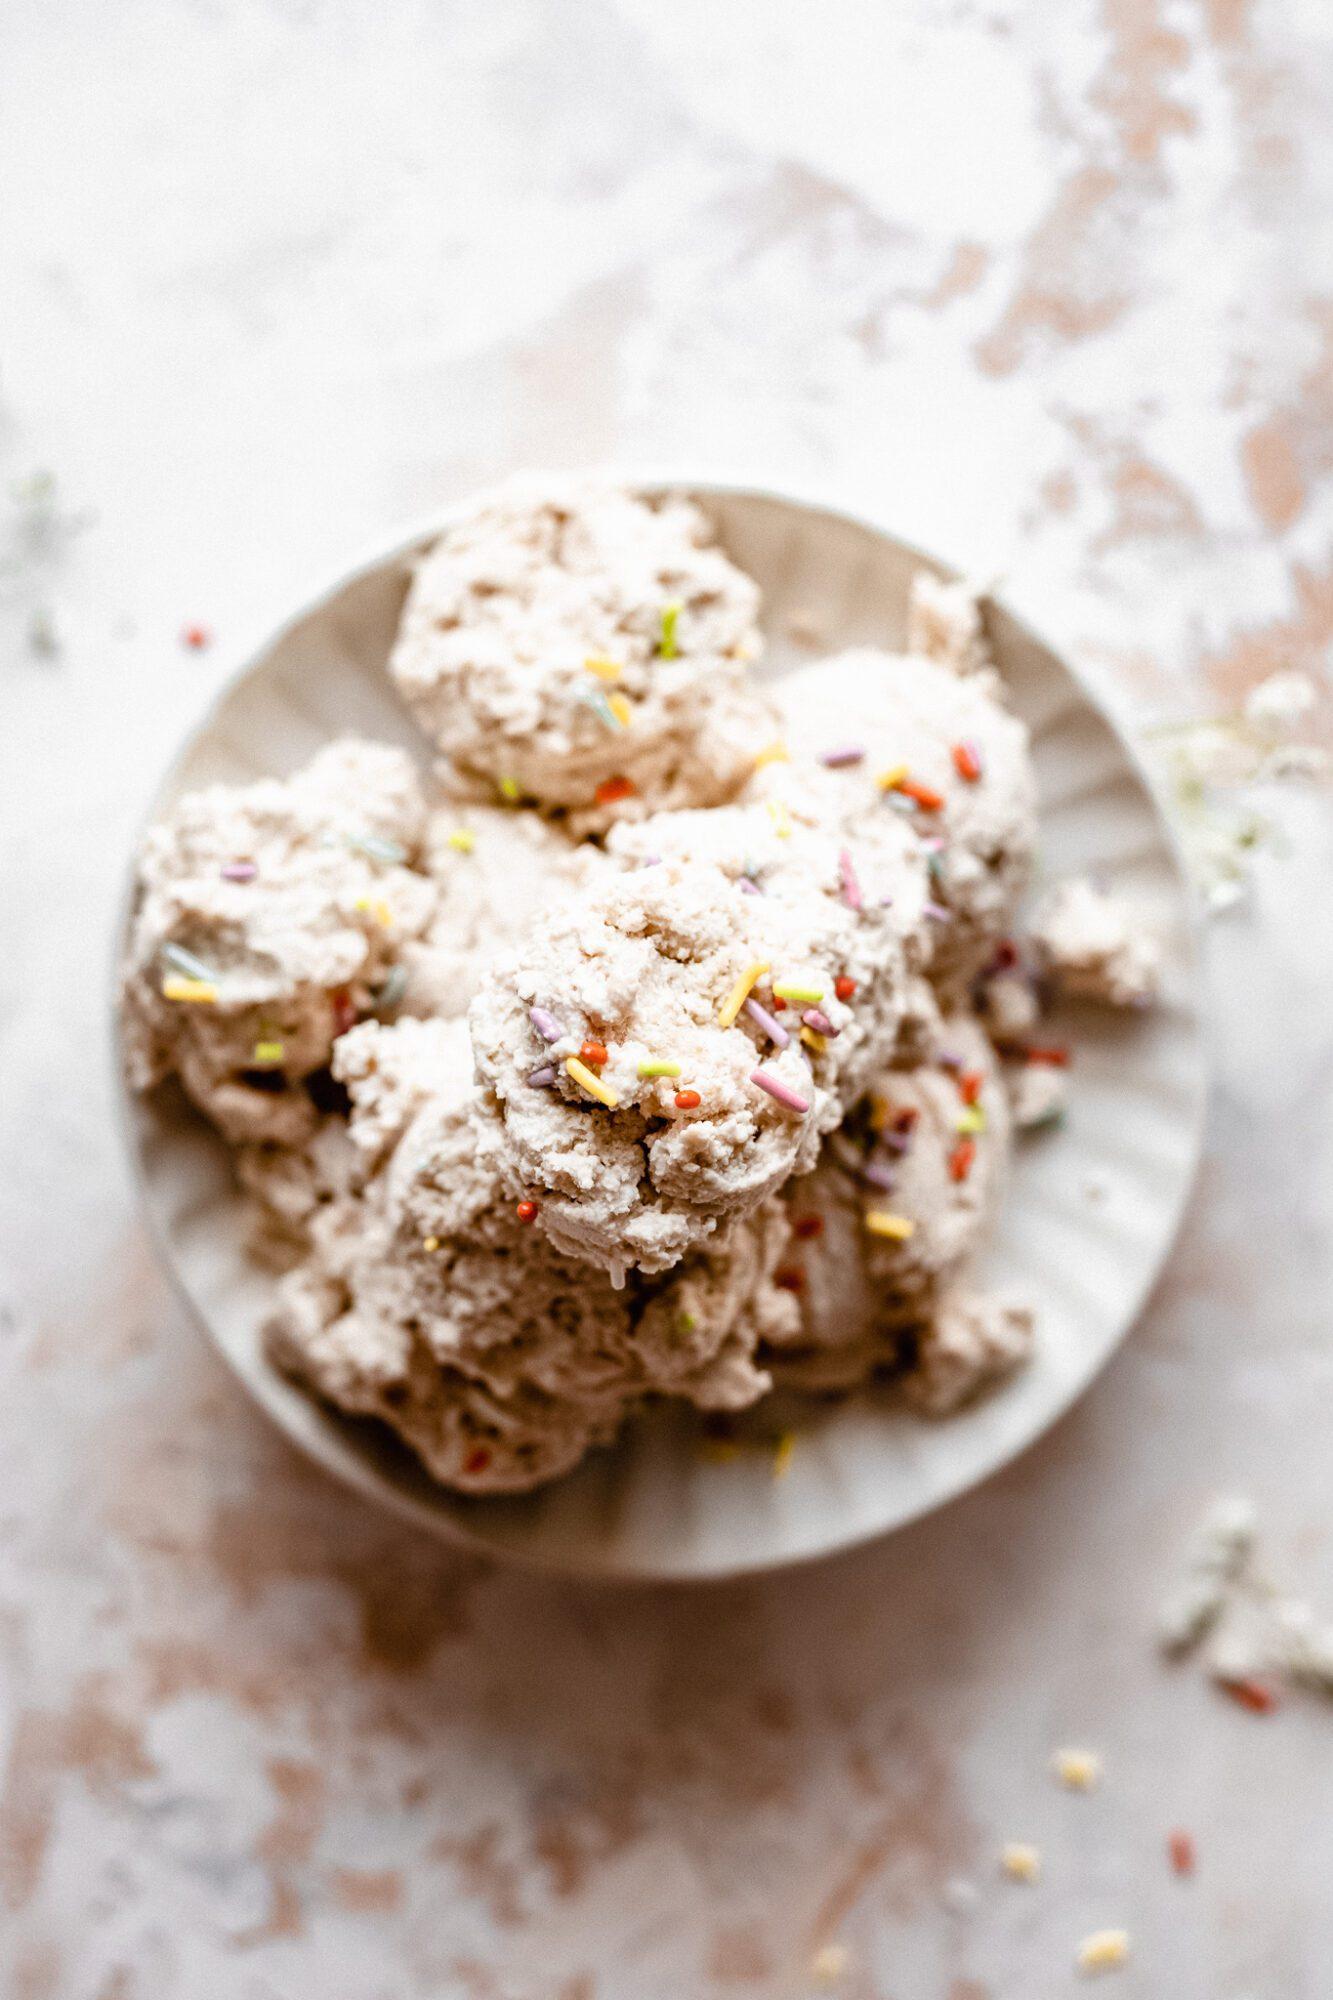 plate of vegan ice cream with sprinkles